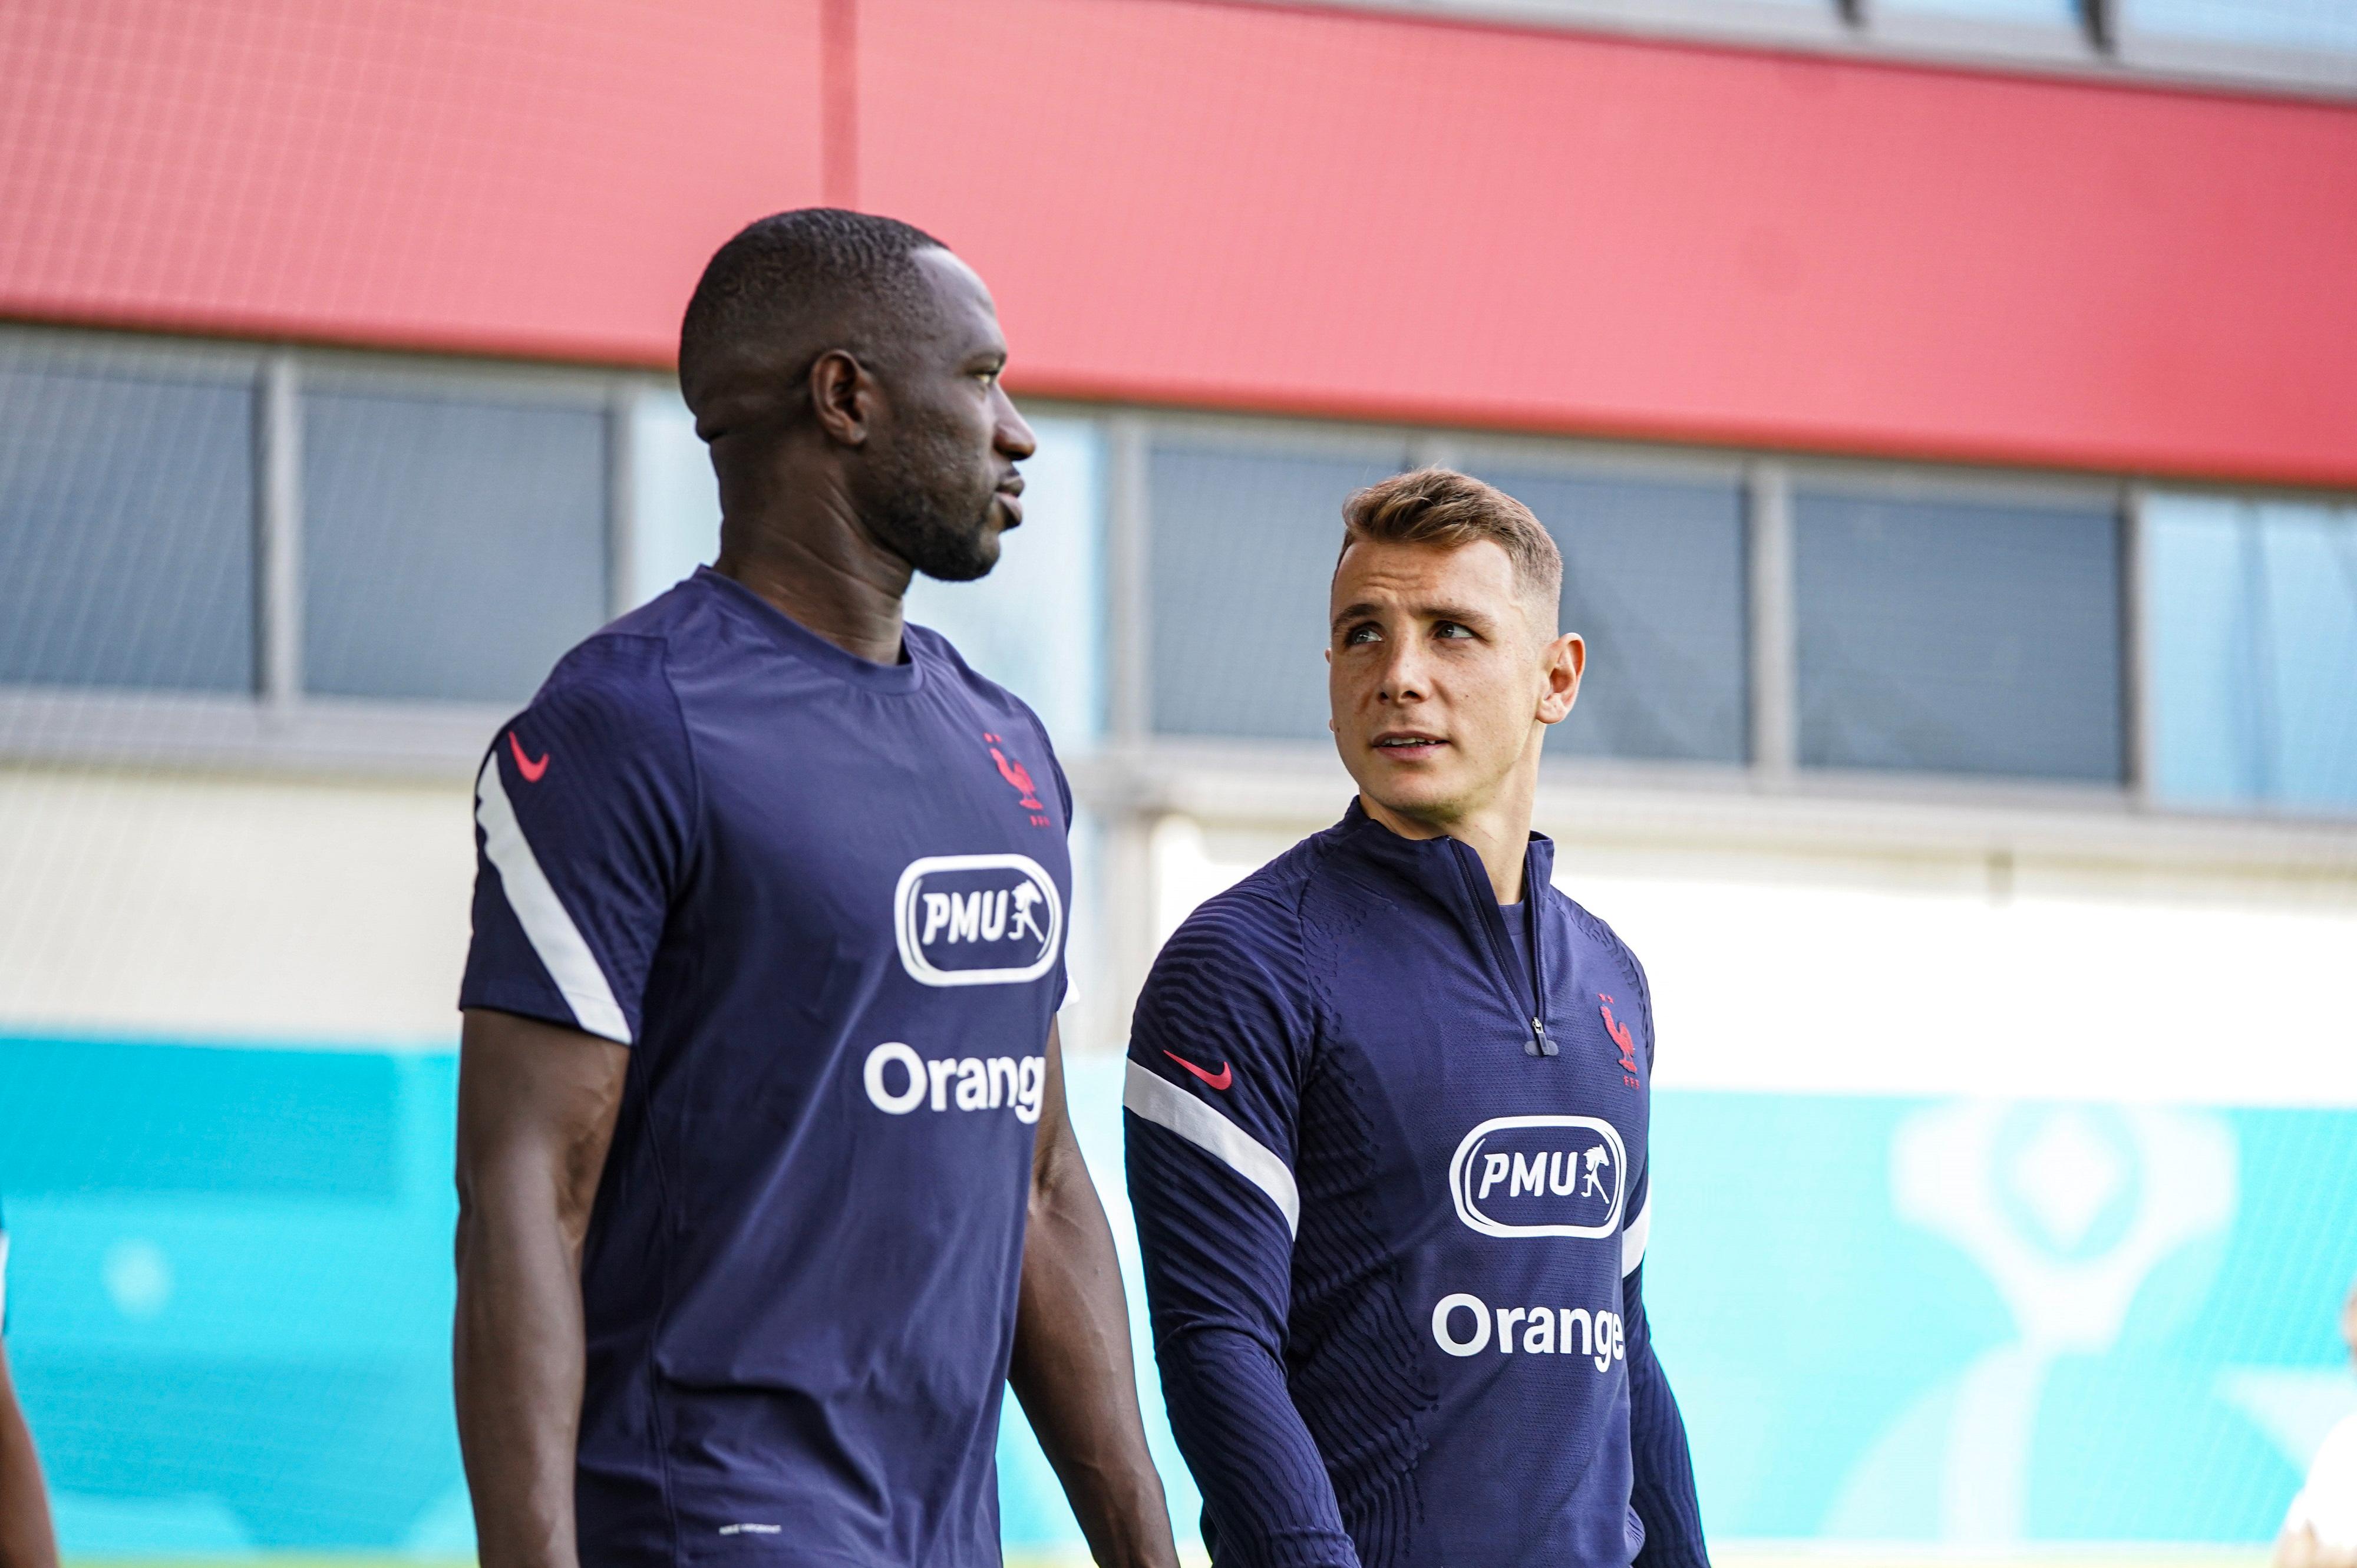 Moussa Sissoko et Lucas Digne